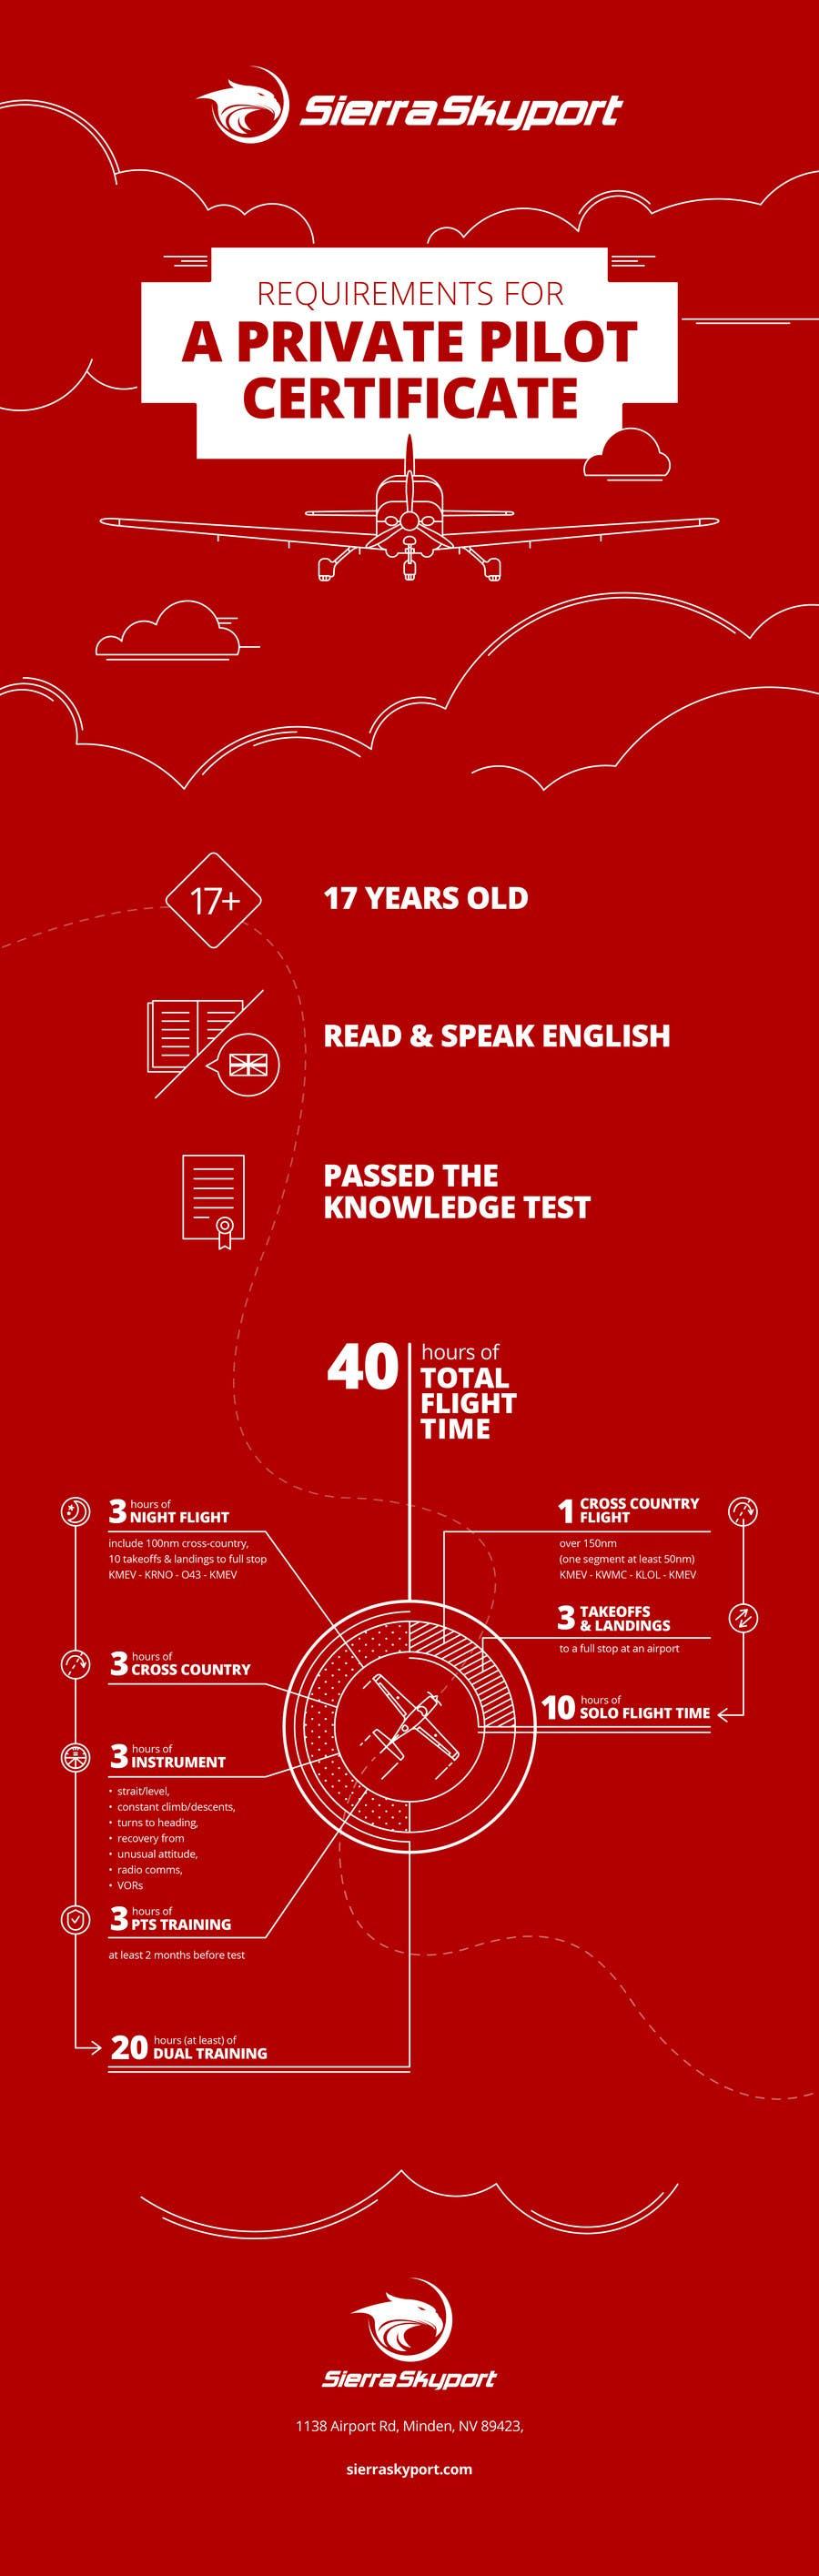 Kilpailutyö #17 kilpailussa Create an Infographic that Illustrates the Requirements for a Private Pilot Certificate